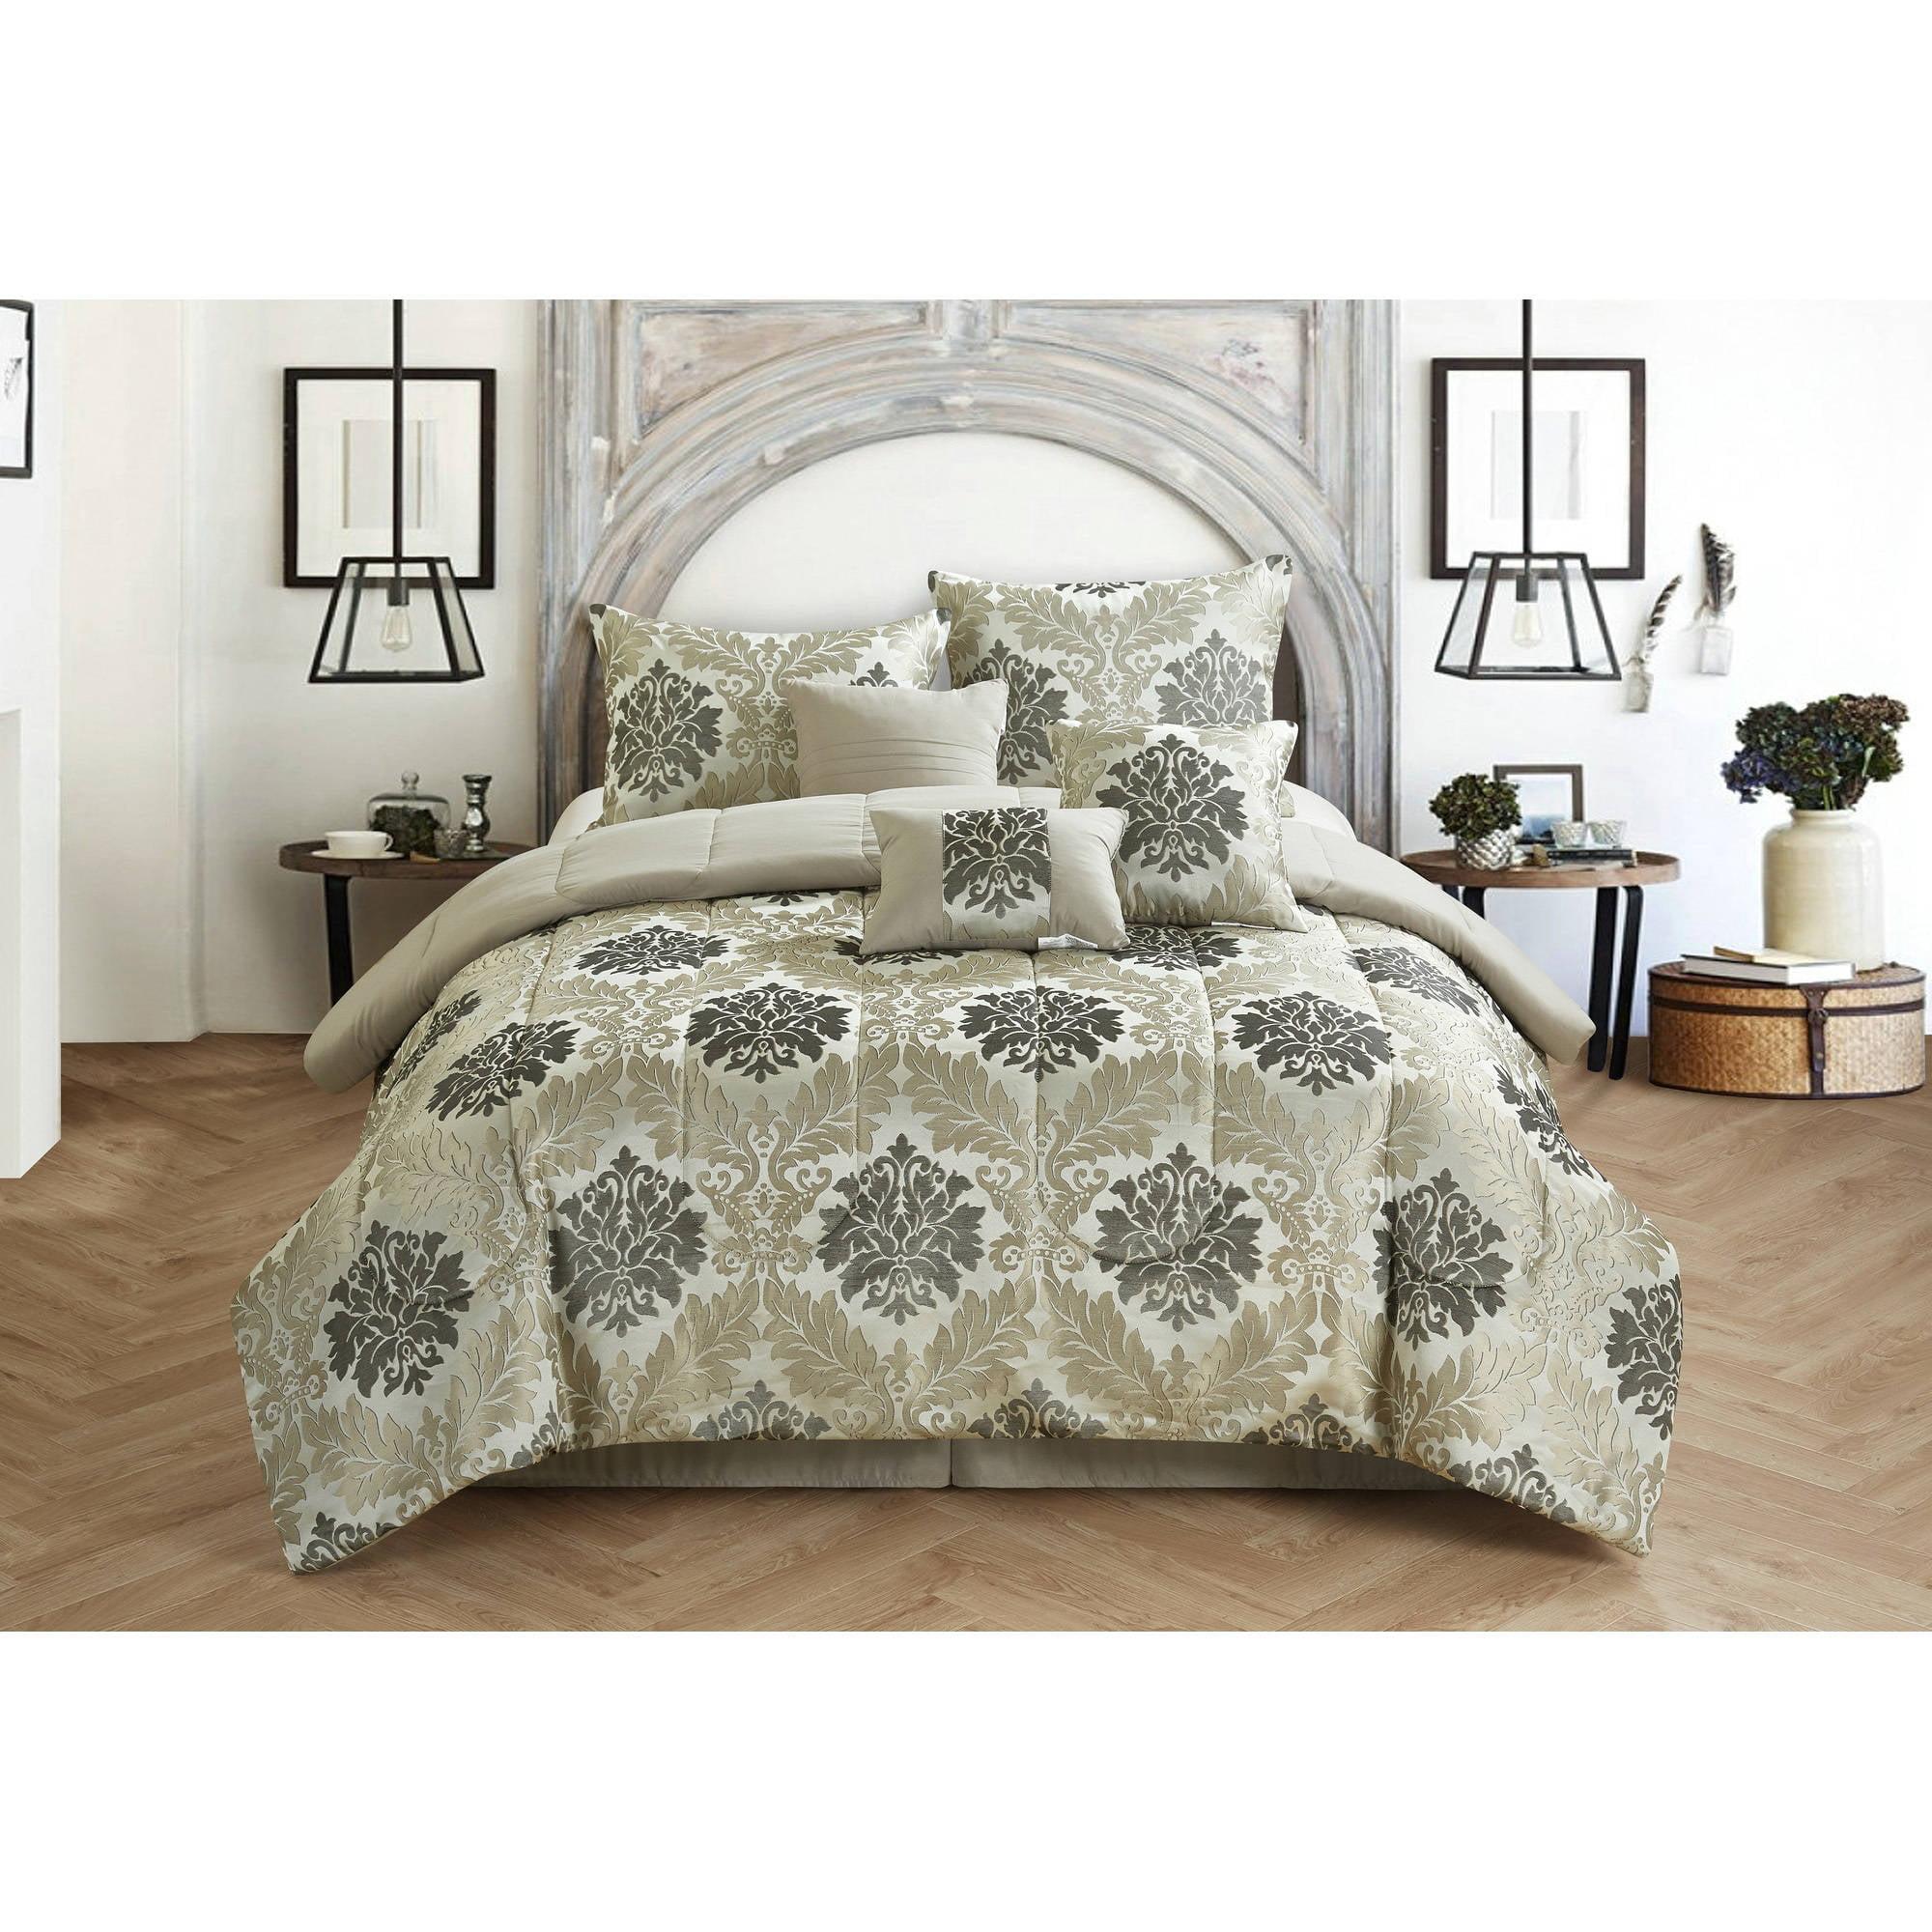 CASA Victoria Jacquard 7-Piece Bedding Comforter Set